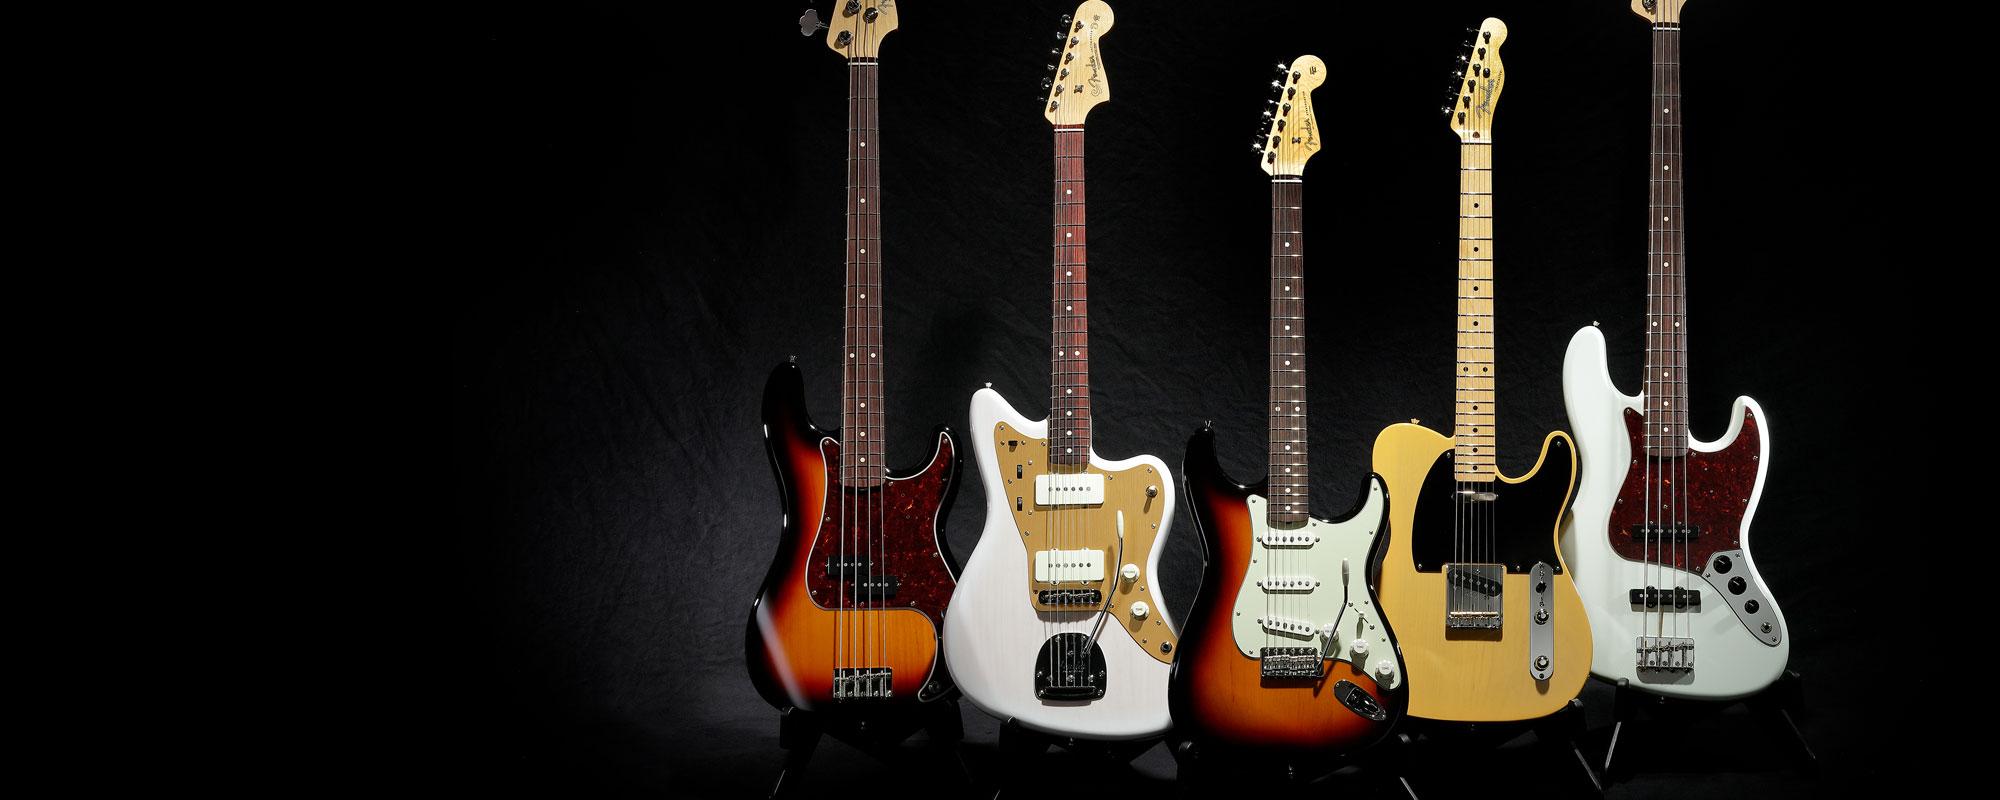 Fender MADE IN JAPAN HERITAGE